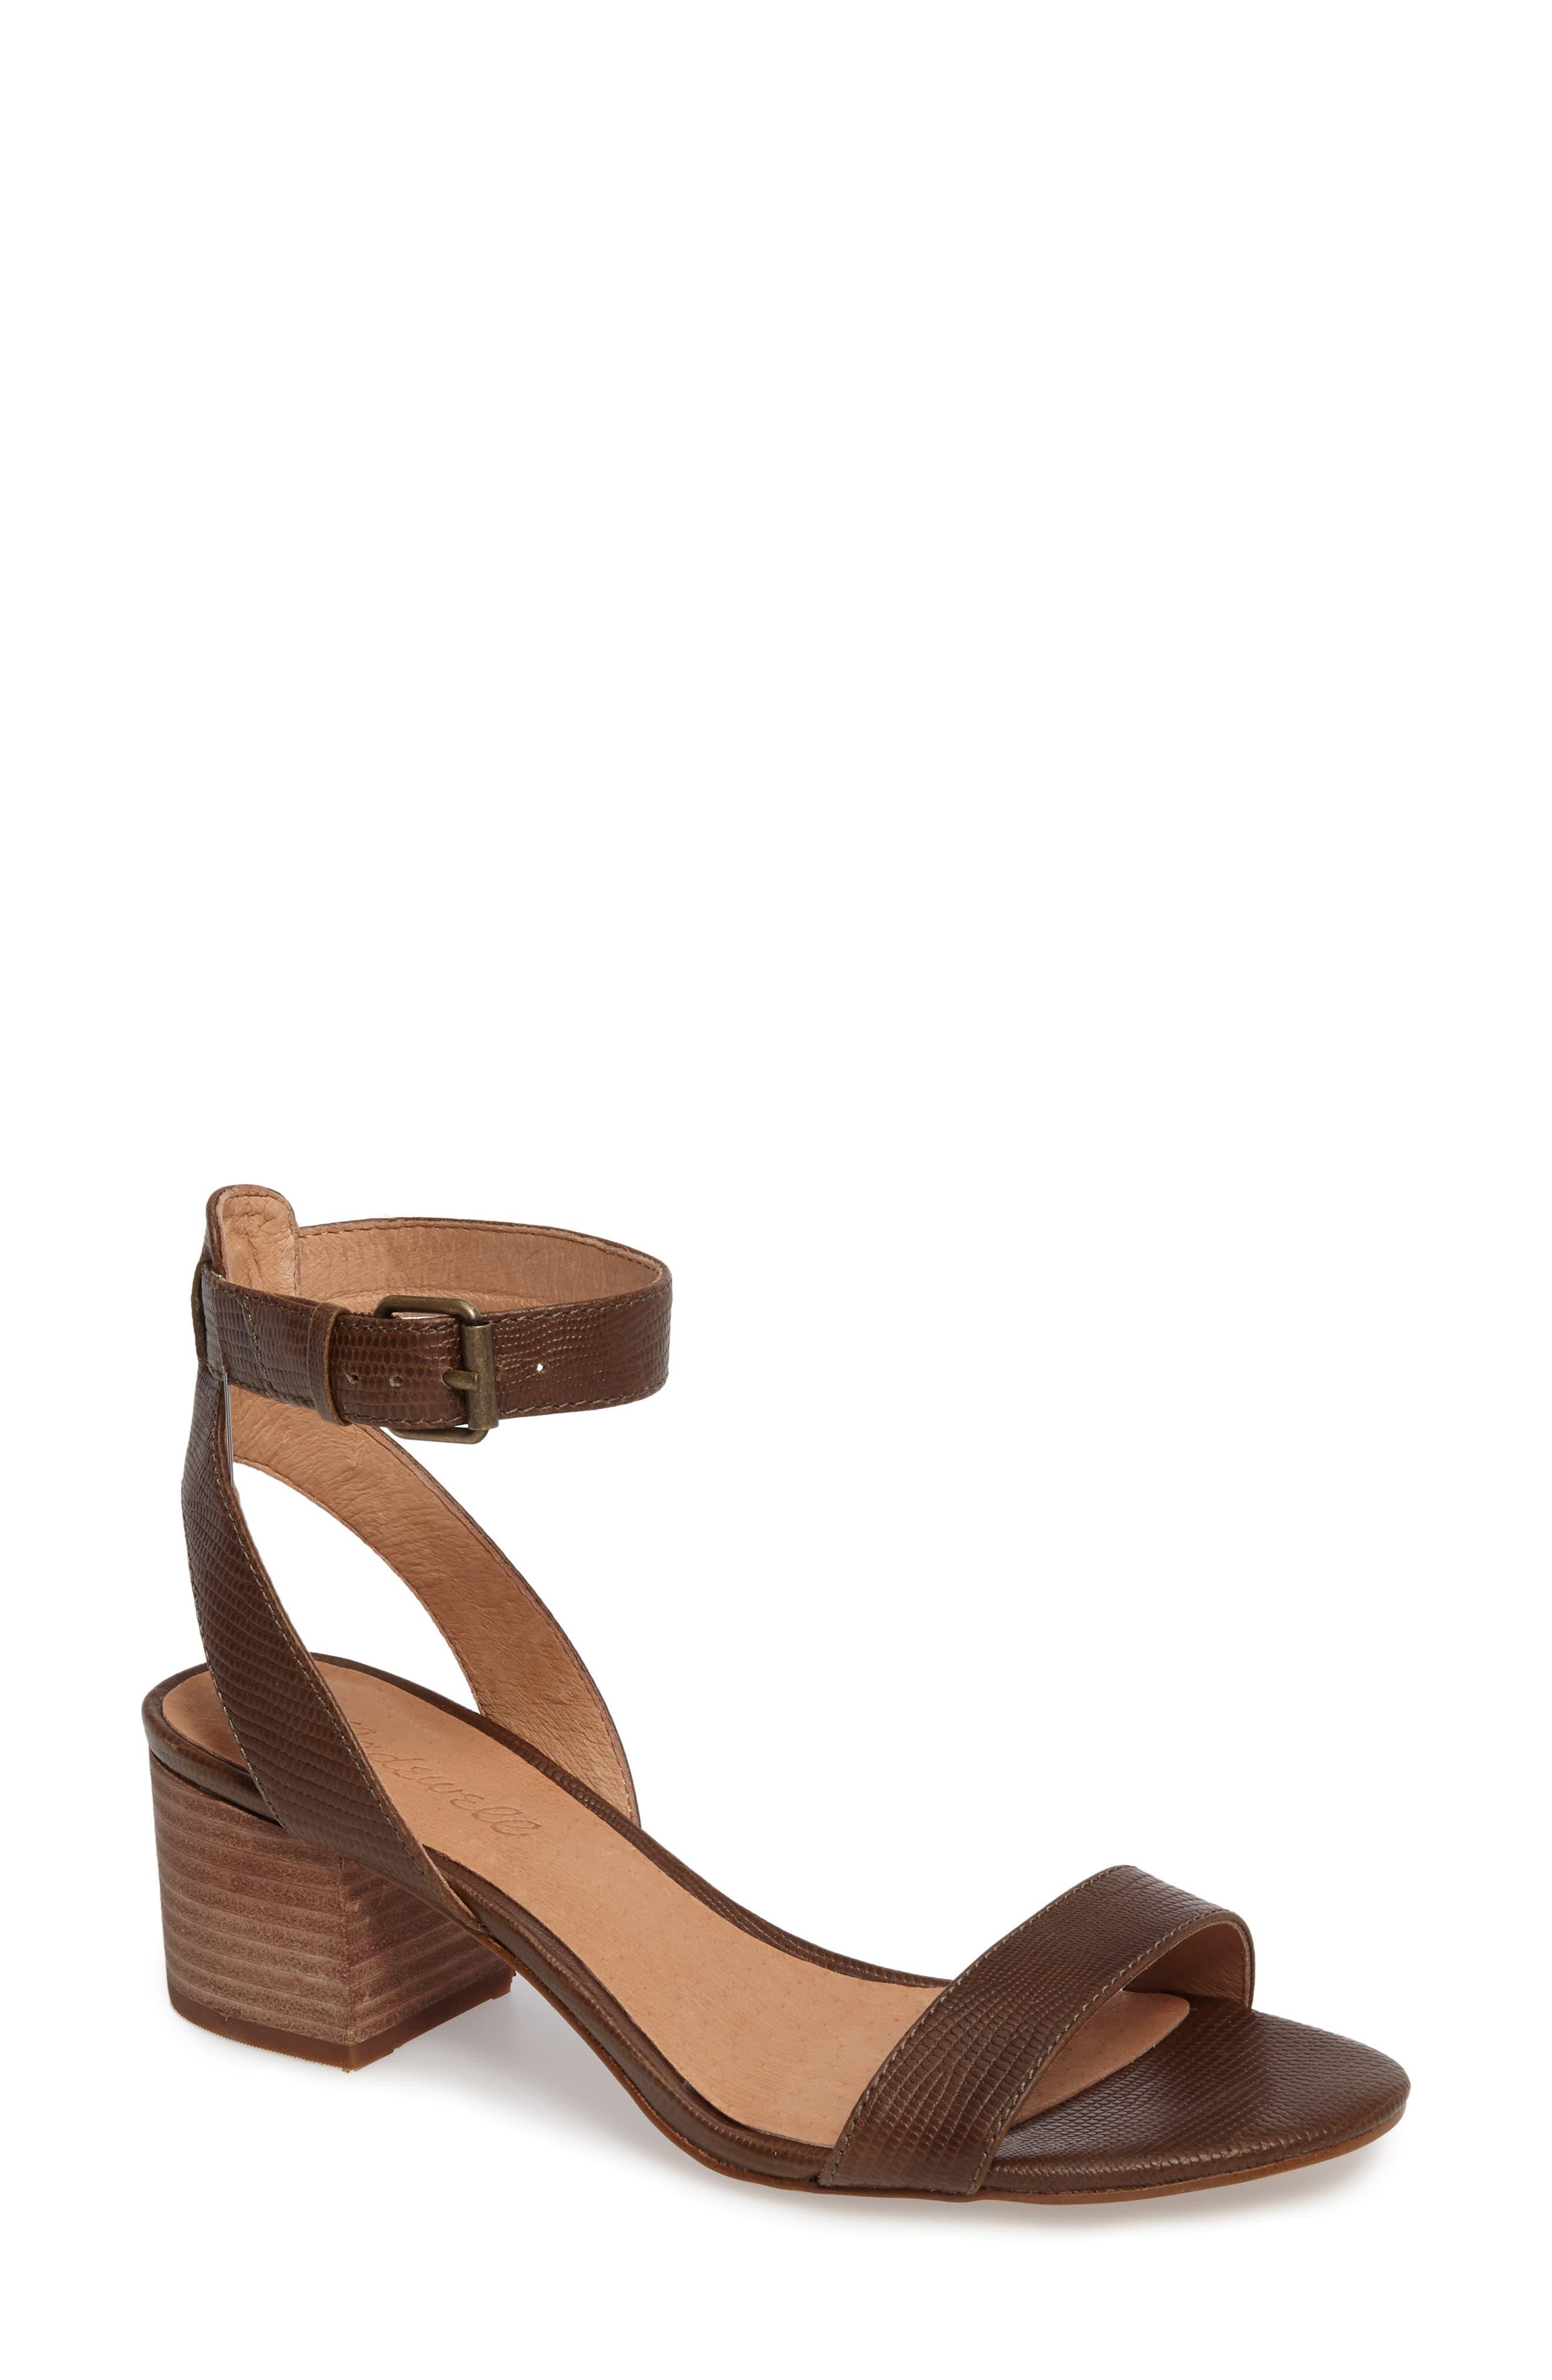 Alice Embossed Ankle Wrap Sandal,                         Main,                         color, Safari Khaki Leather